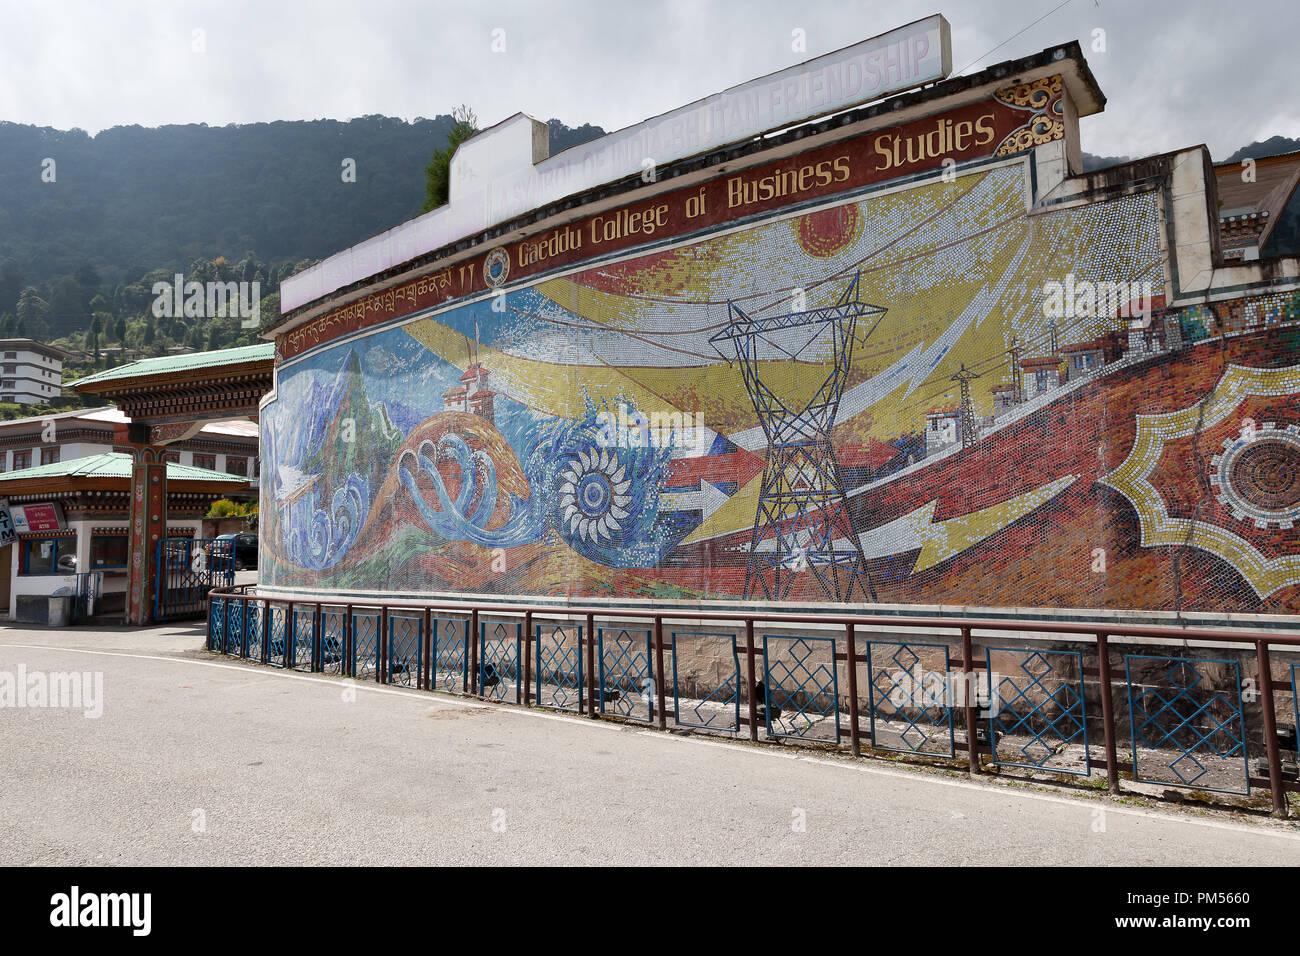 Entrance to Gaeddu College of Business Studies in Thimphu Bhutan. - Stock Image